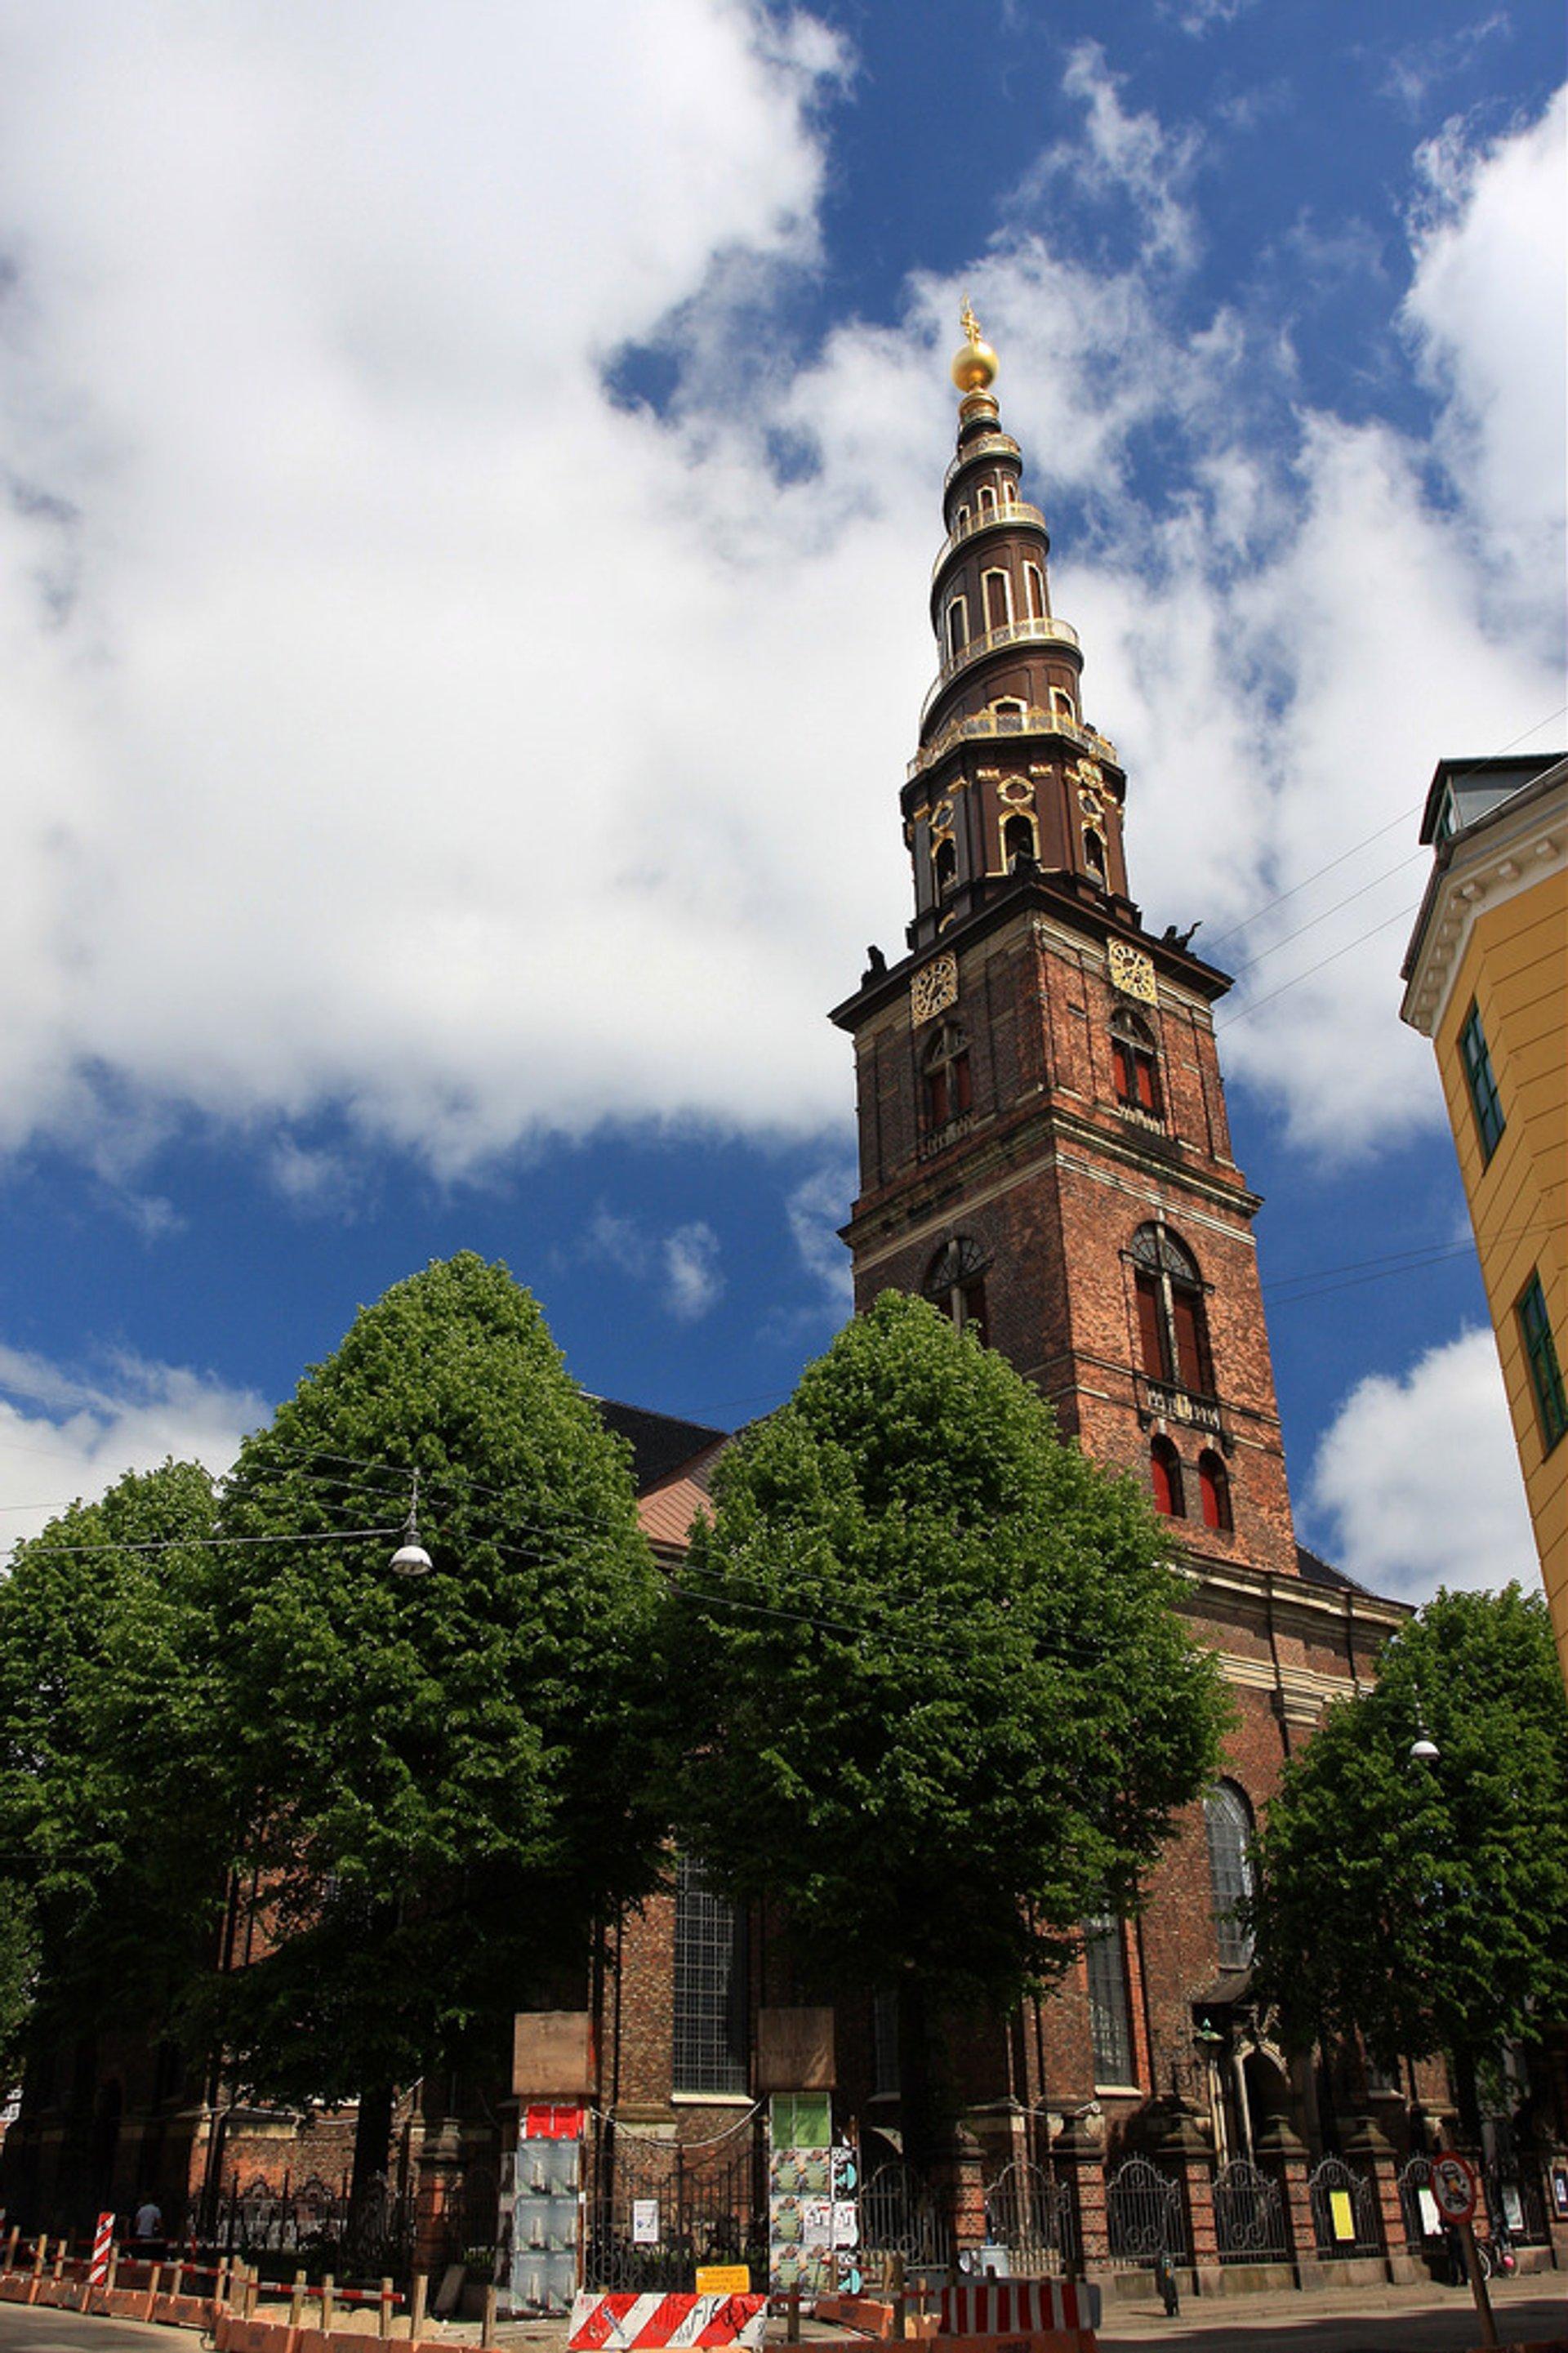 Tower of Our Saviour's Church in Copenhagen - Best Season 2020